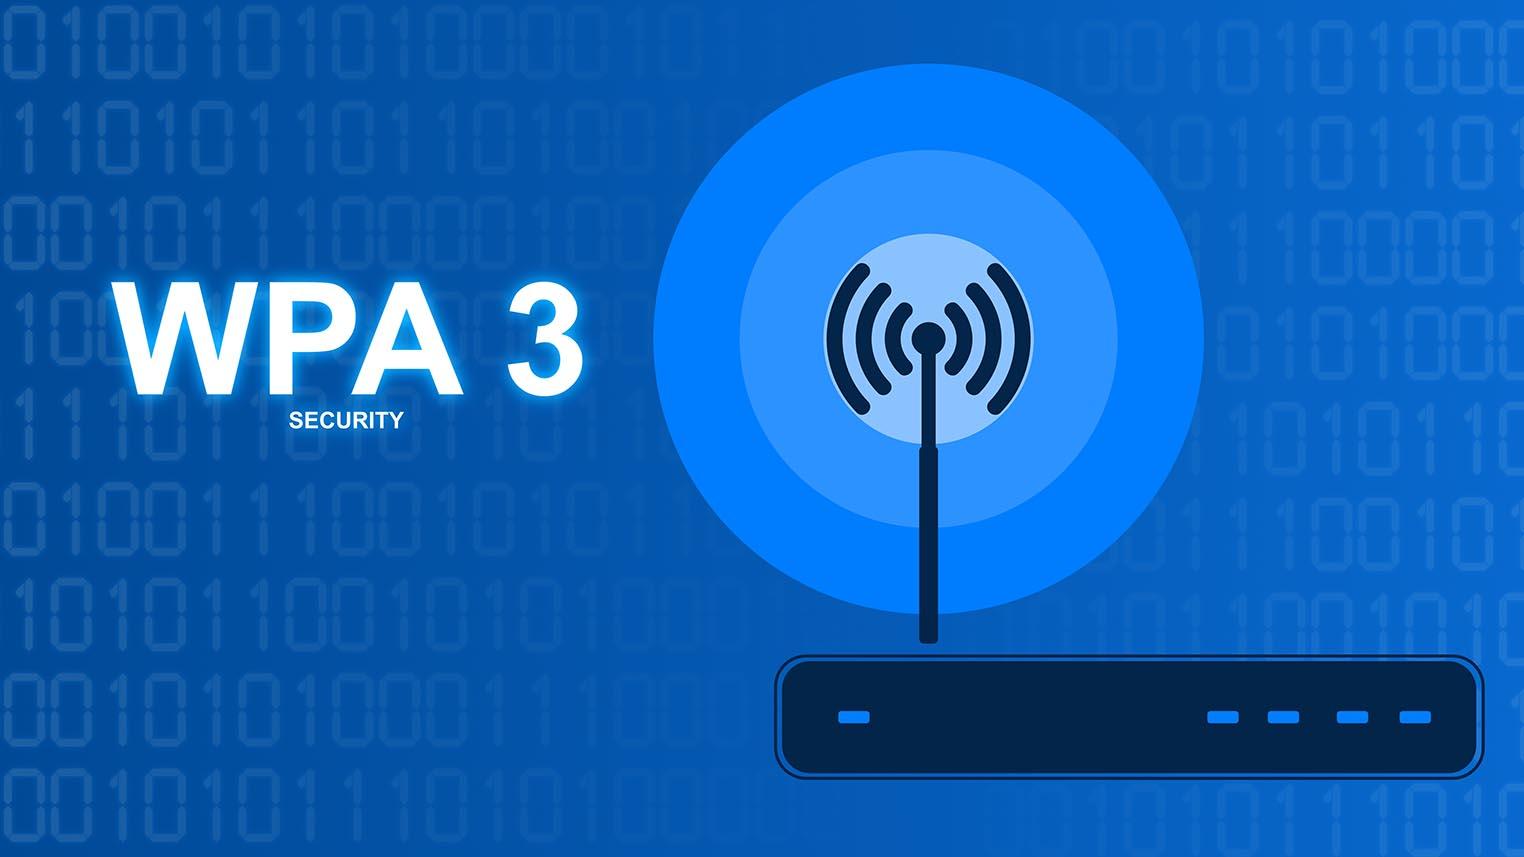 Consomac Wi Fi Le Wpa3 Prochaine Norme De Securite